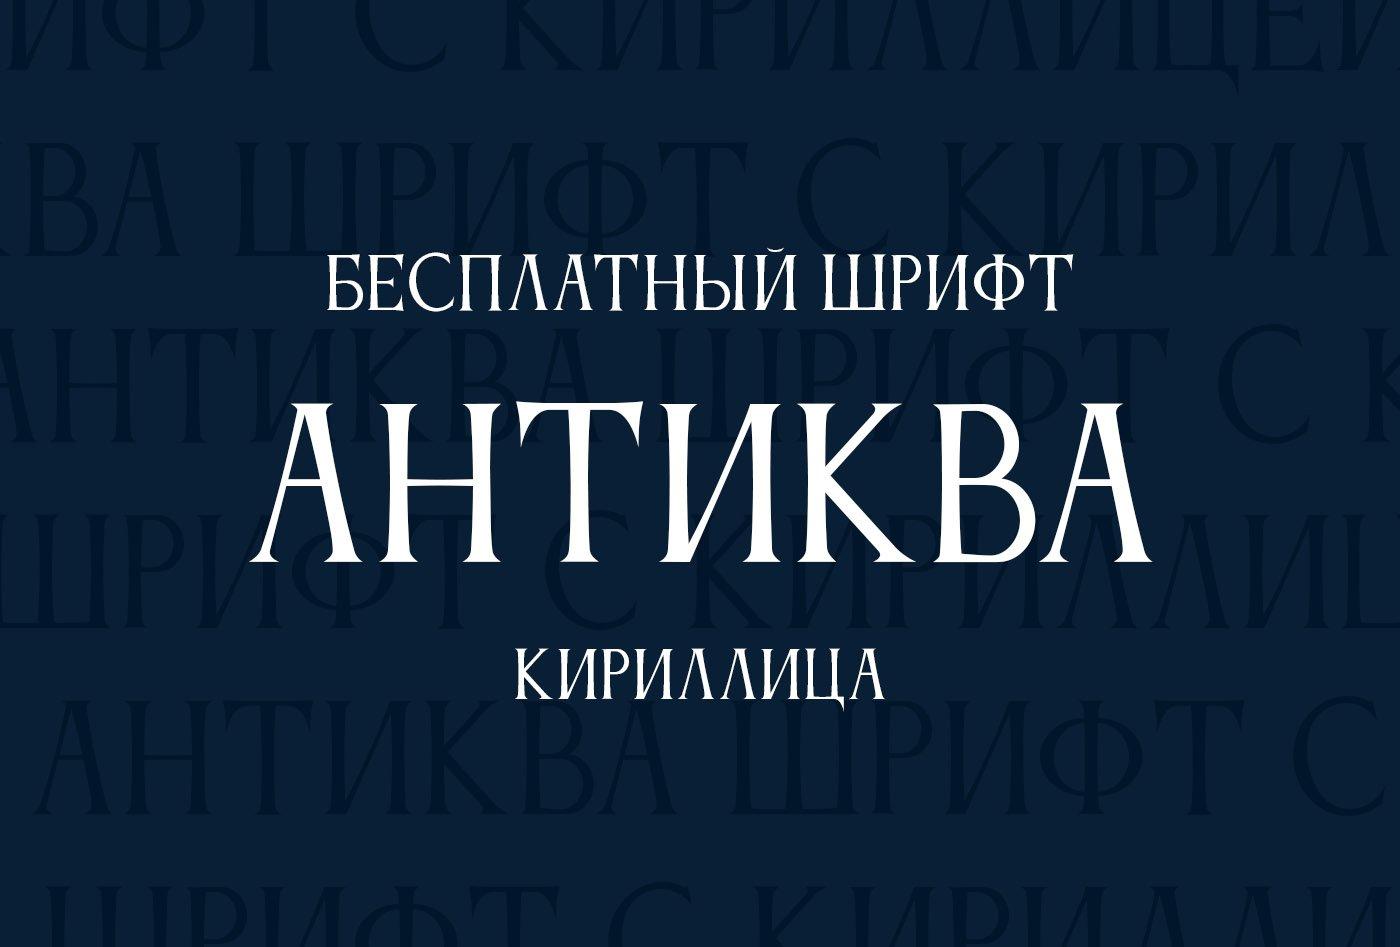 Шрифт Anticva Cyrillic